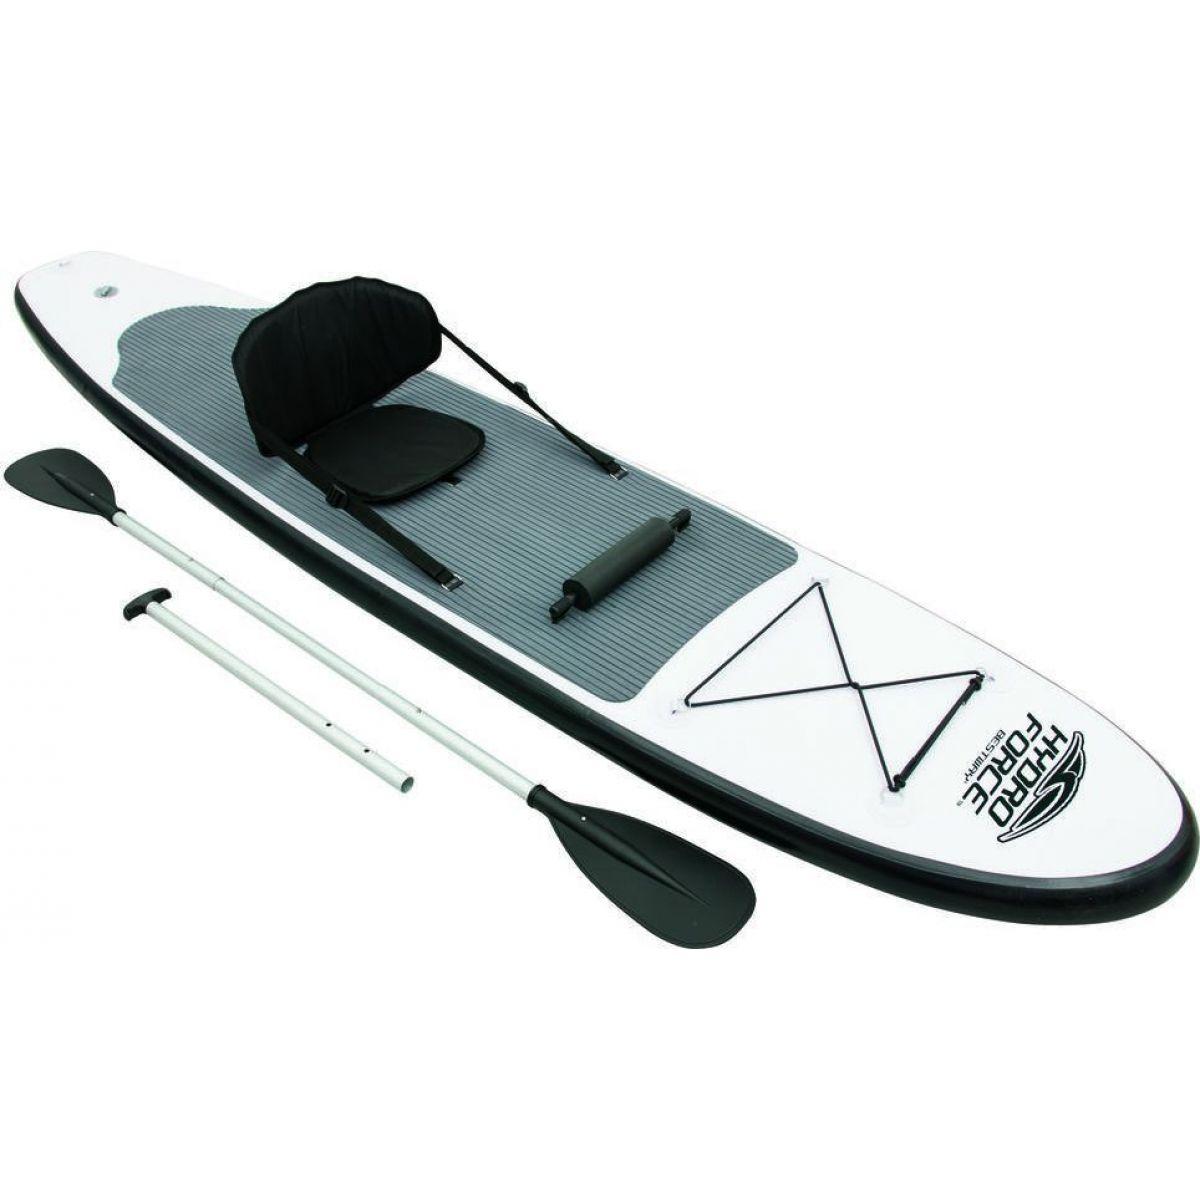 Bestway Paddle Board Wave Edge SUP 310x68x10cm